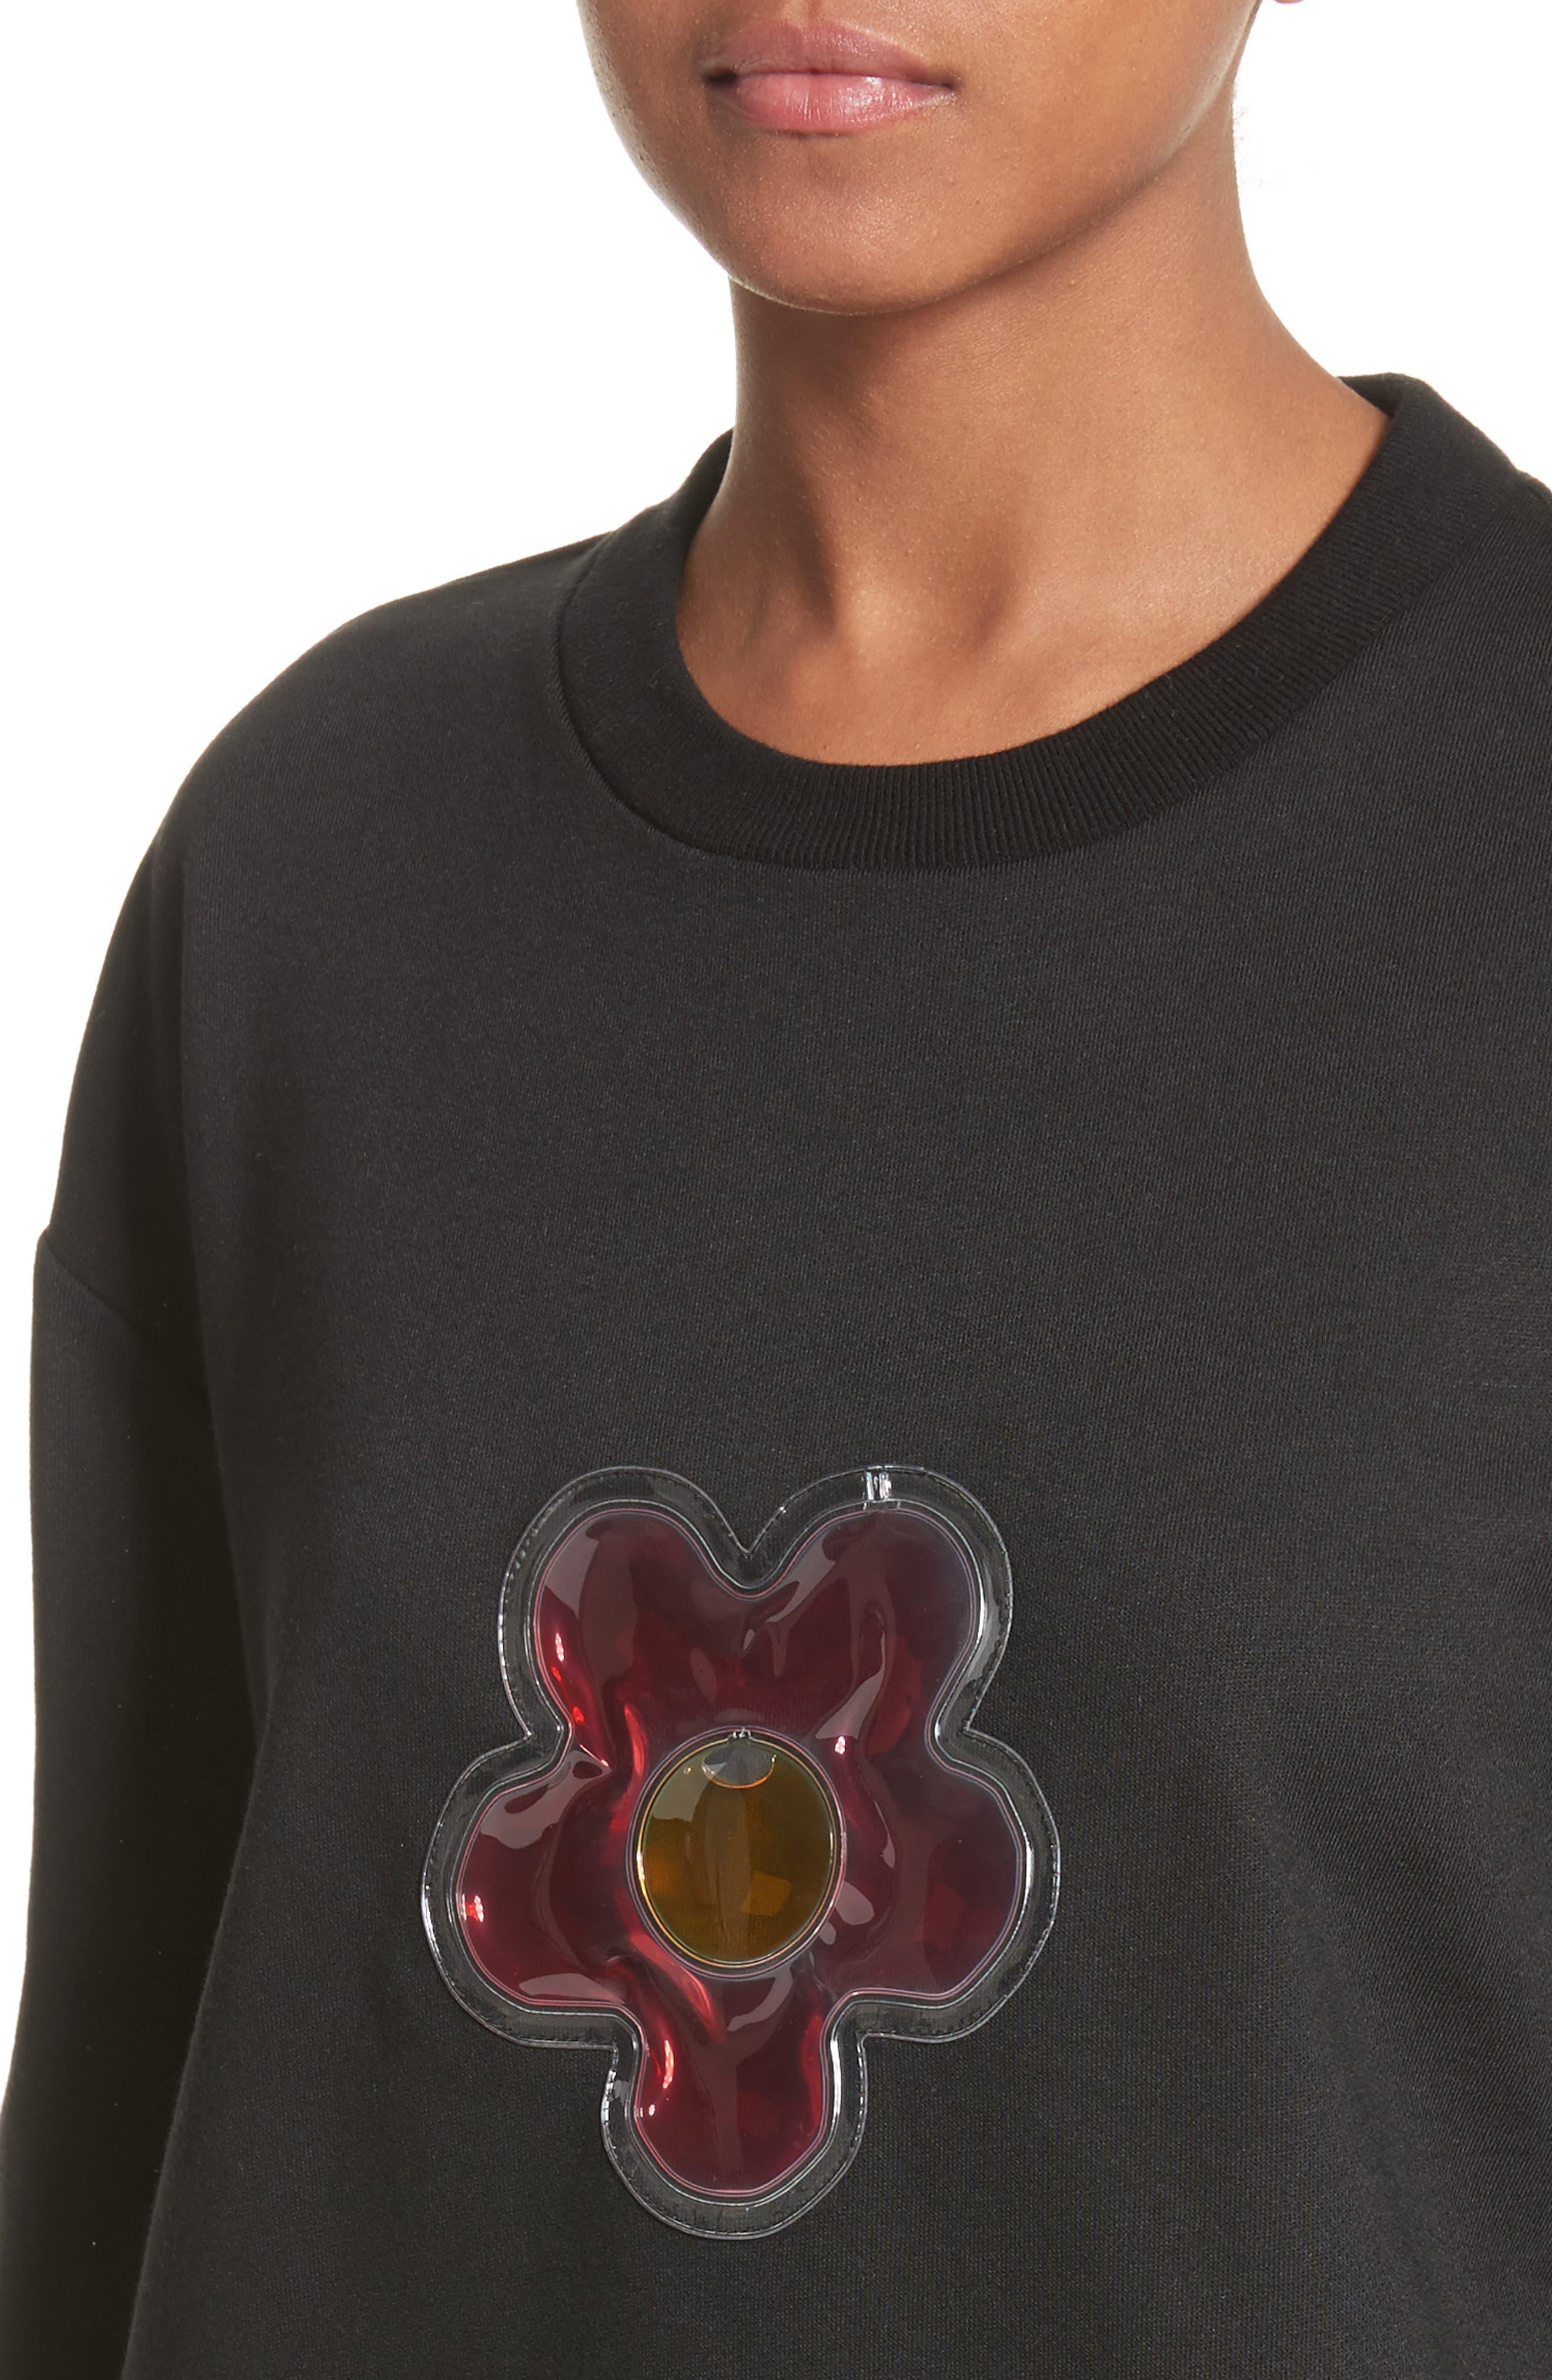 Barnacles Flower Sweatshirt,                             Alternate thumbnail 4, color,